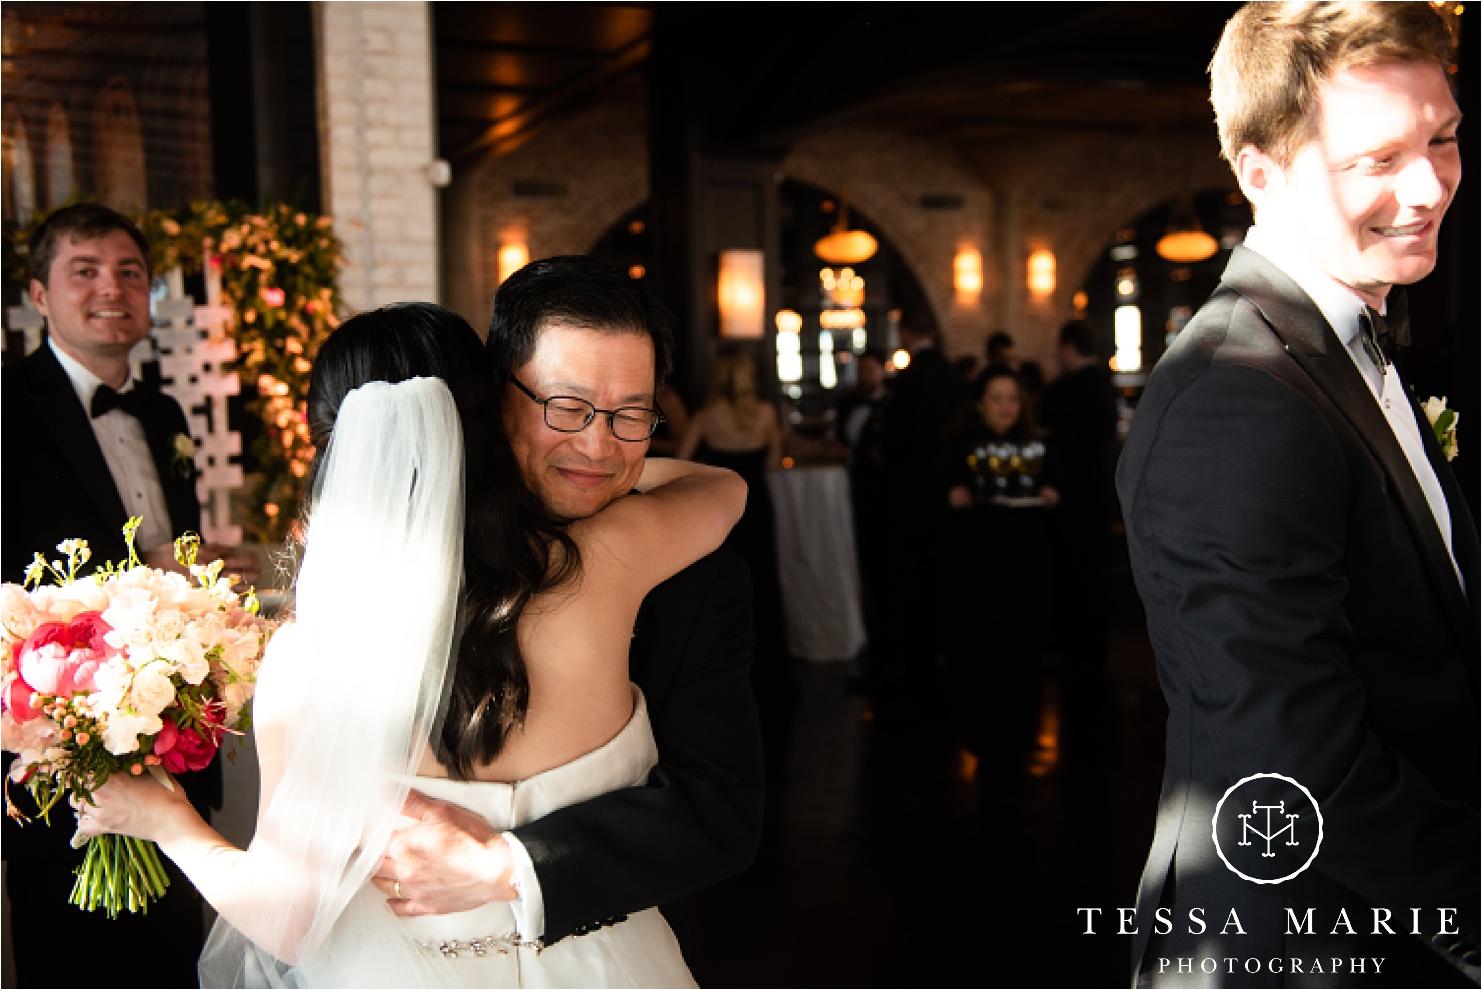 Tessa_marie_weddings_houston_wedding_photographer_The_astorian_0127.jpg